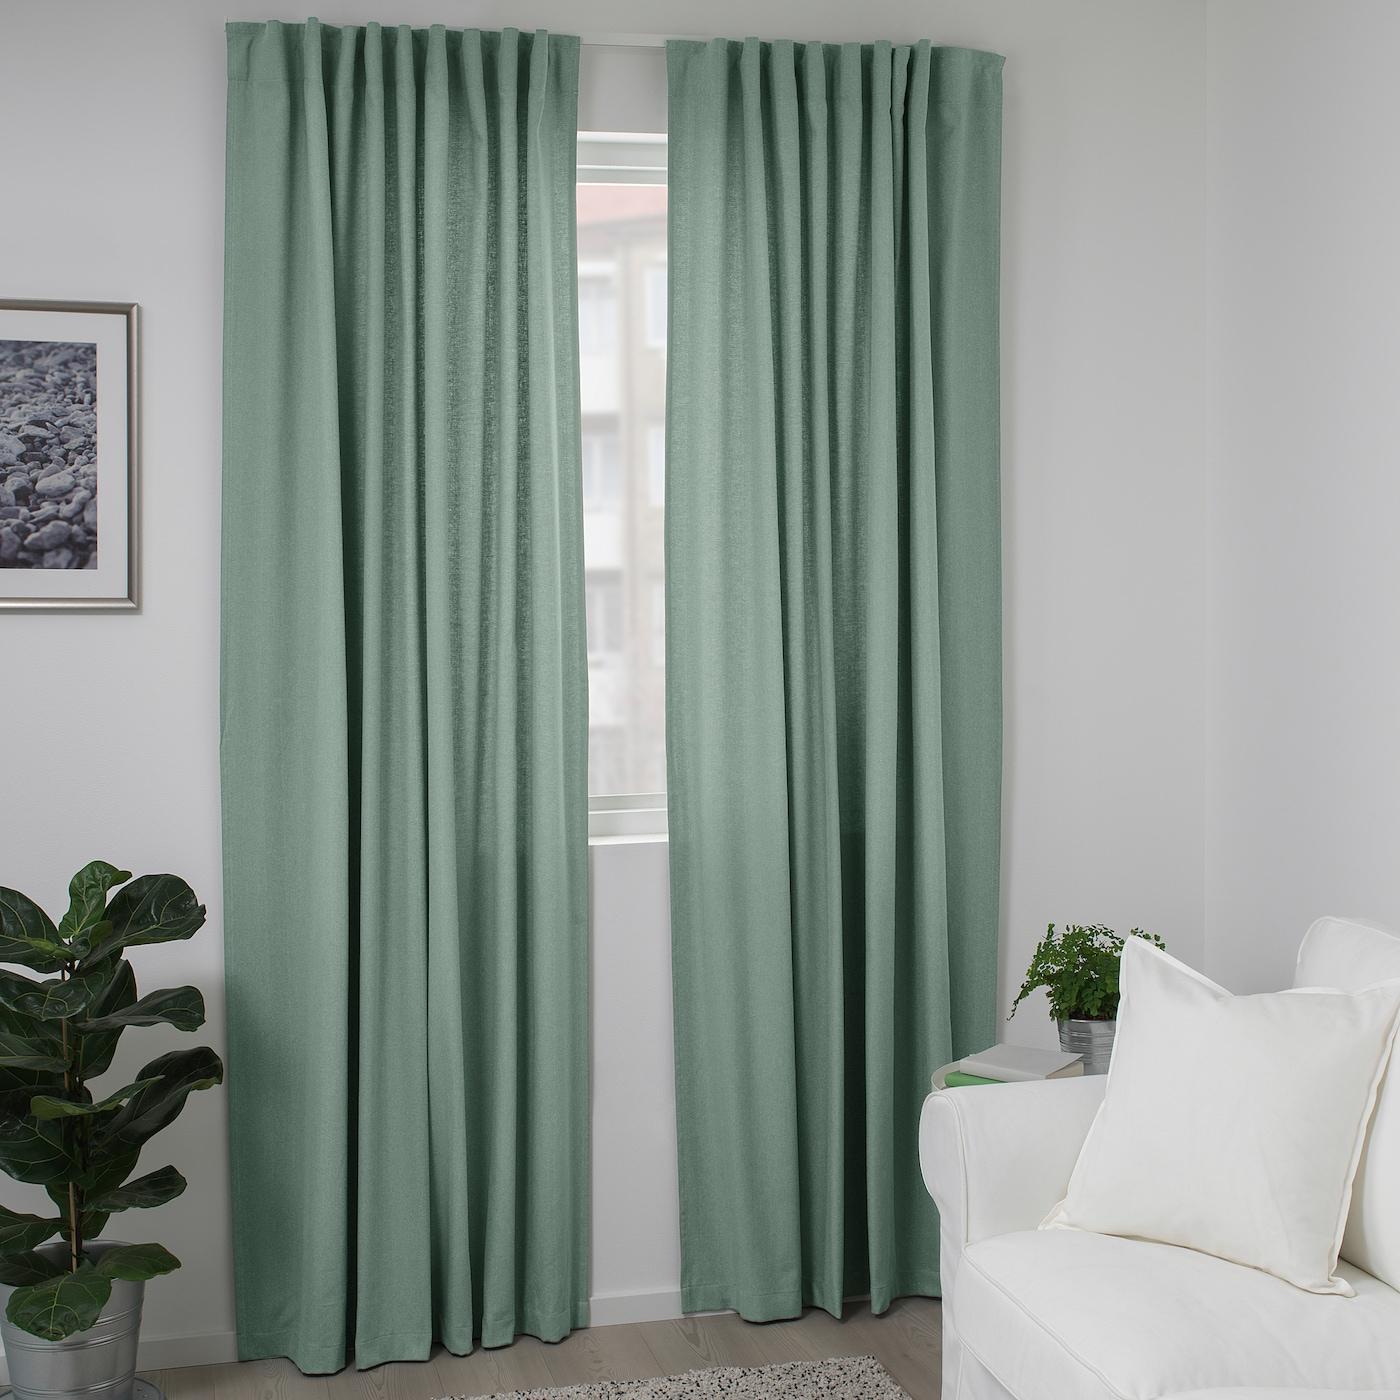 Tibast Curtains 1 Pair Green 145x250 Cm Ikea